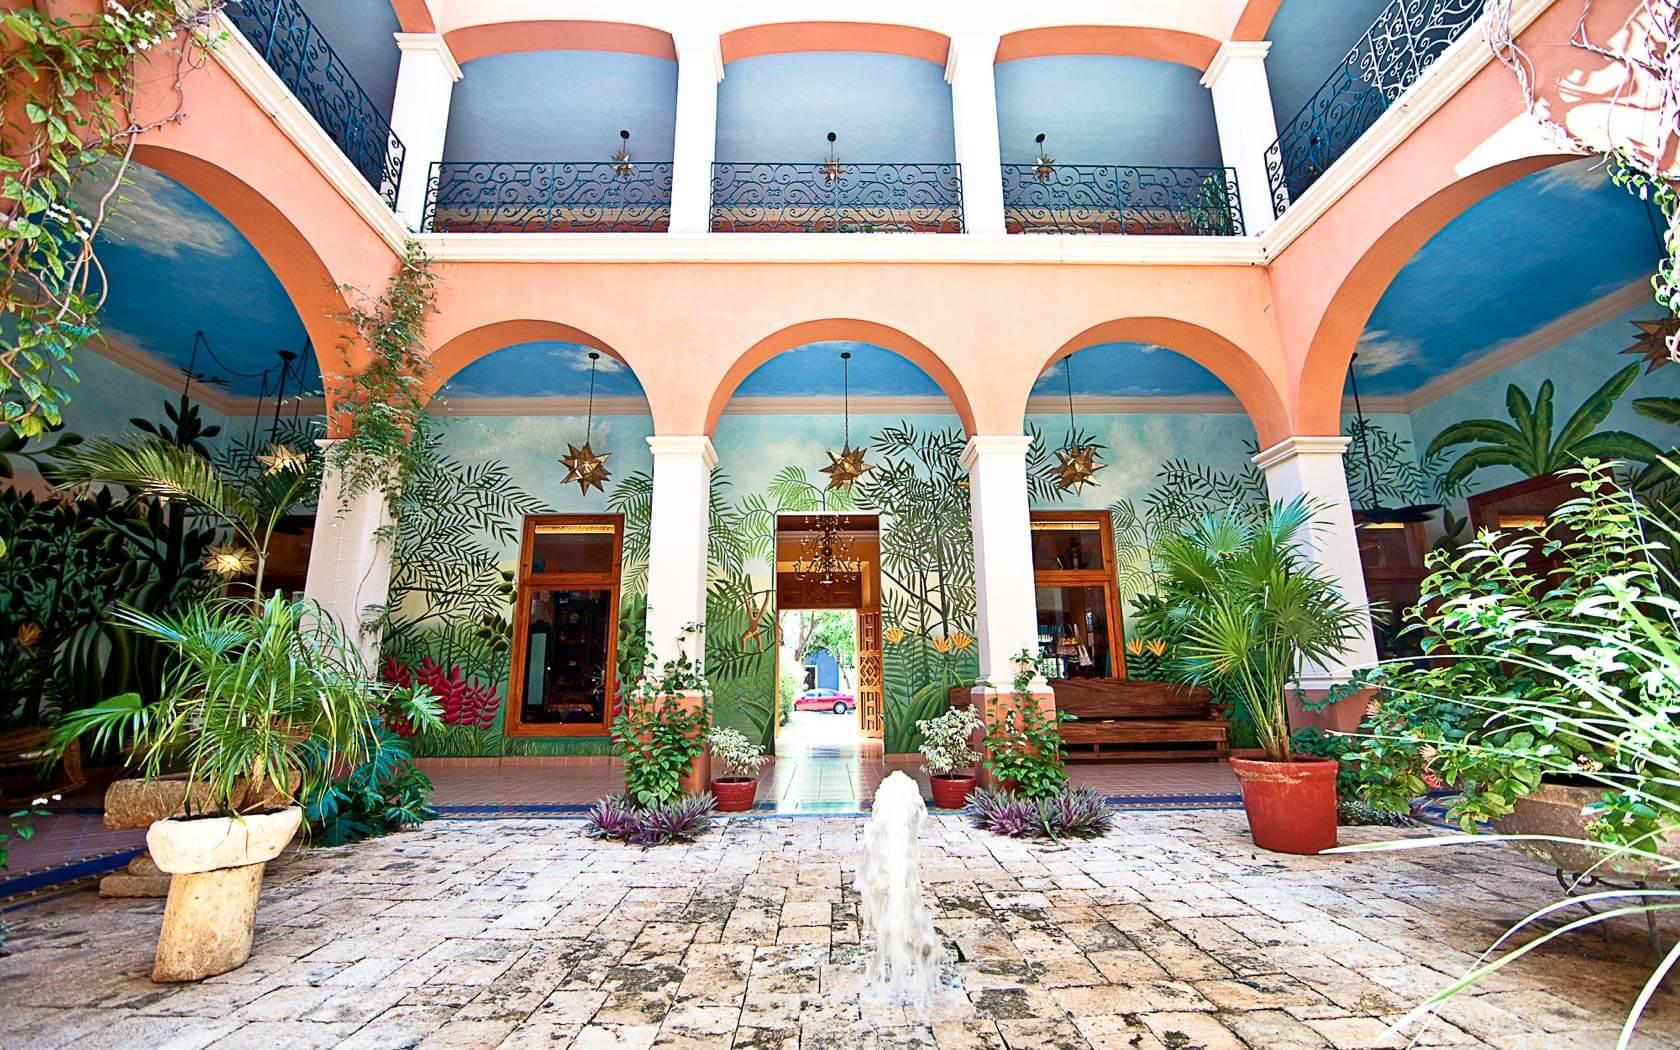 Hotel Casa San Angel Merida